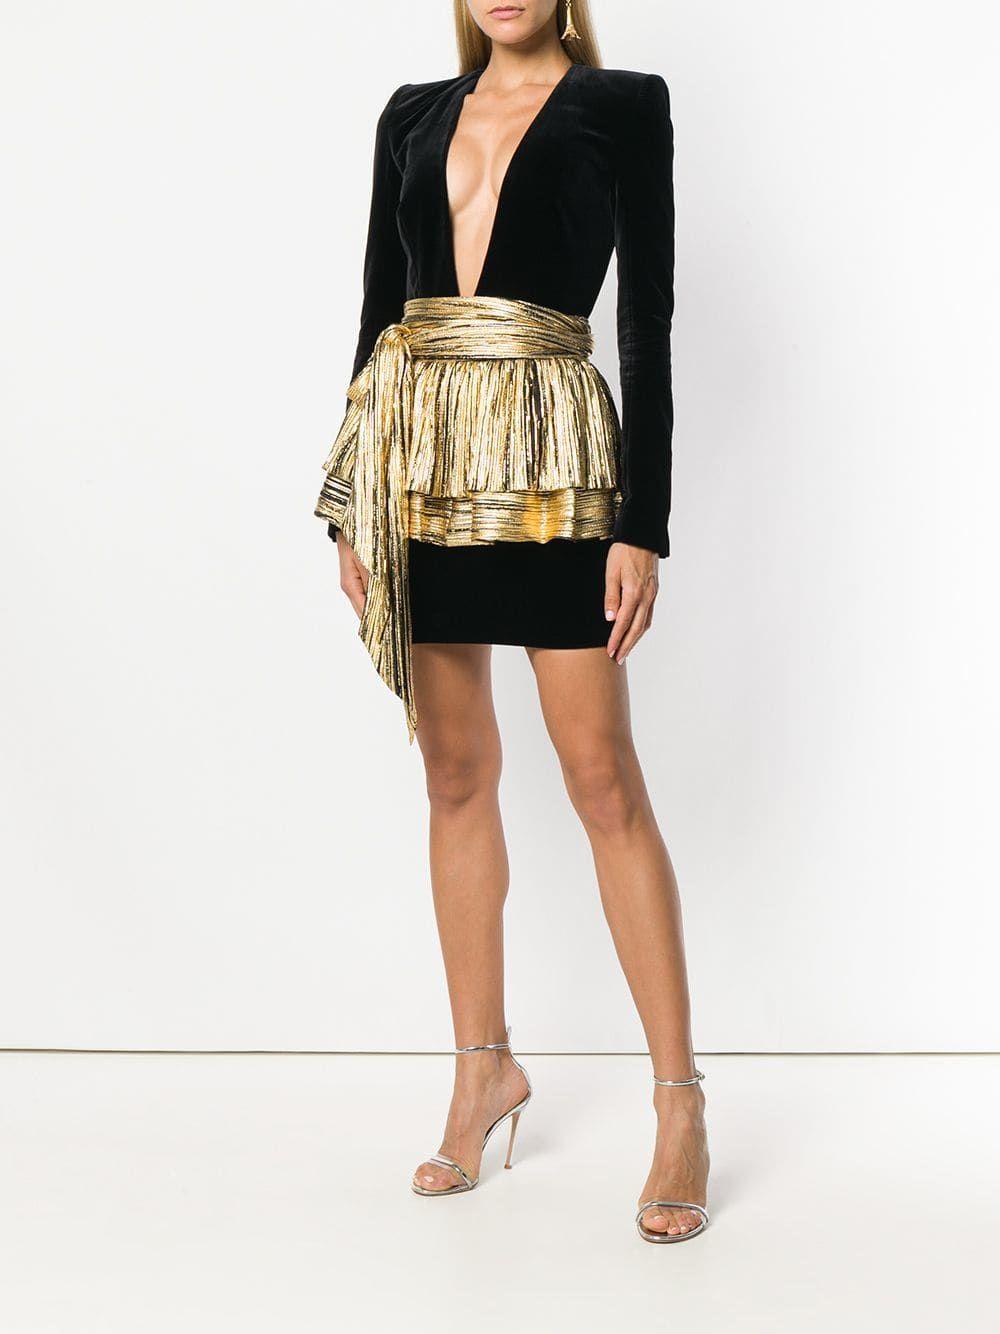 407163ef Alexandre Vauthier deep V-neck dress | Alexandre Vauthier in 2019 ...